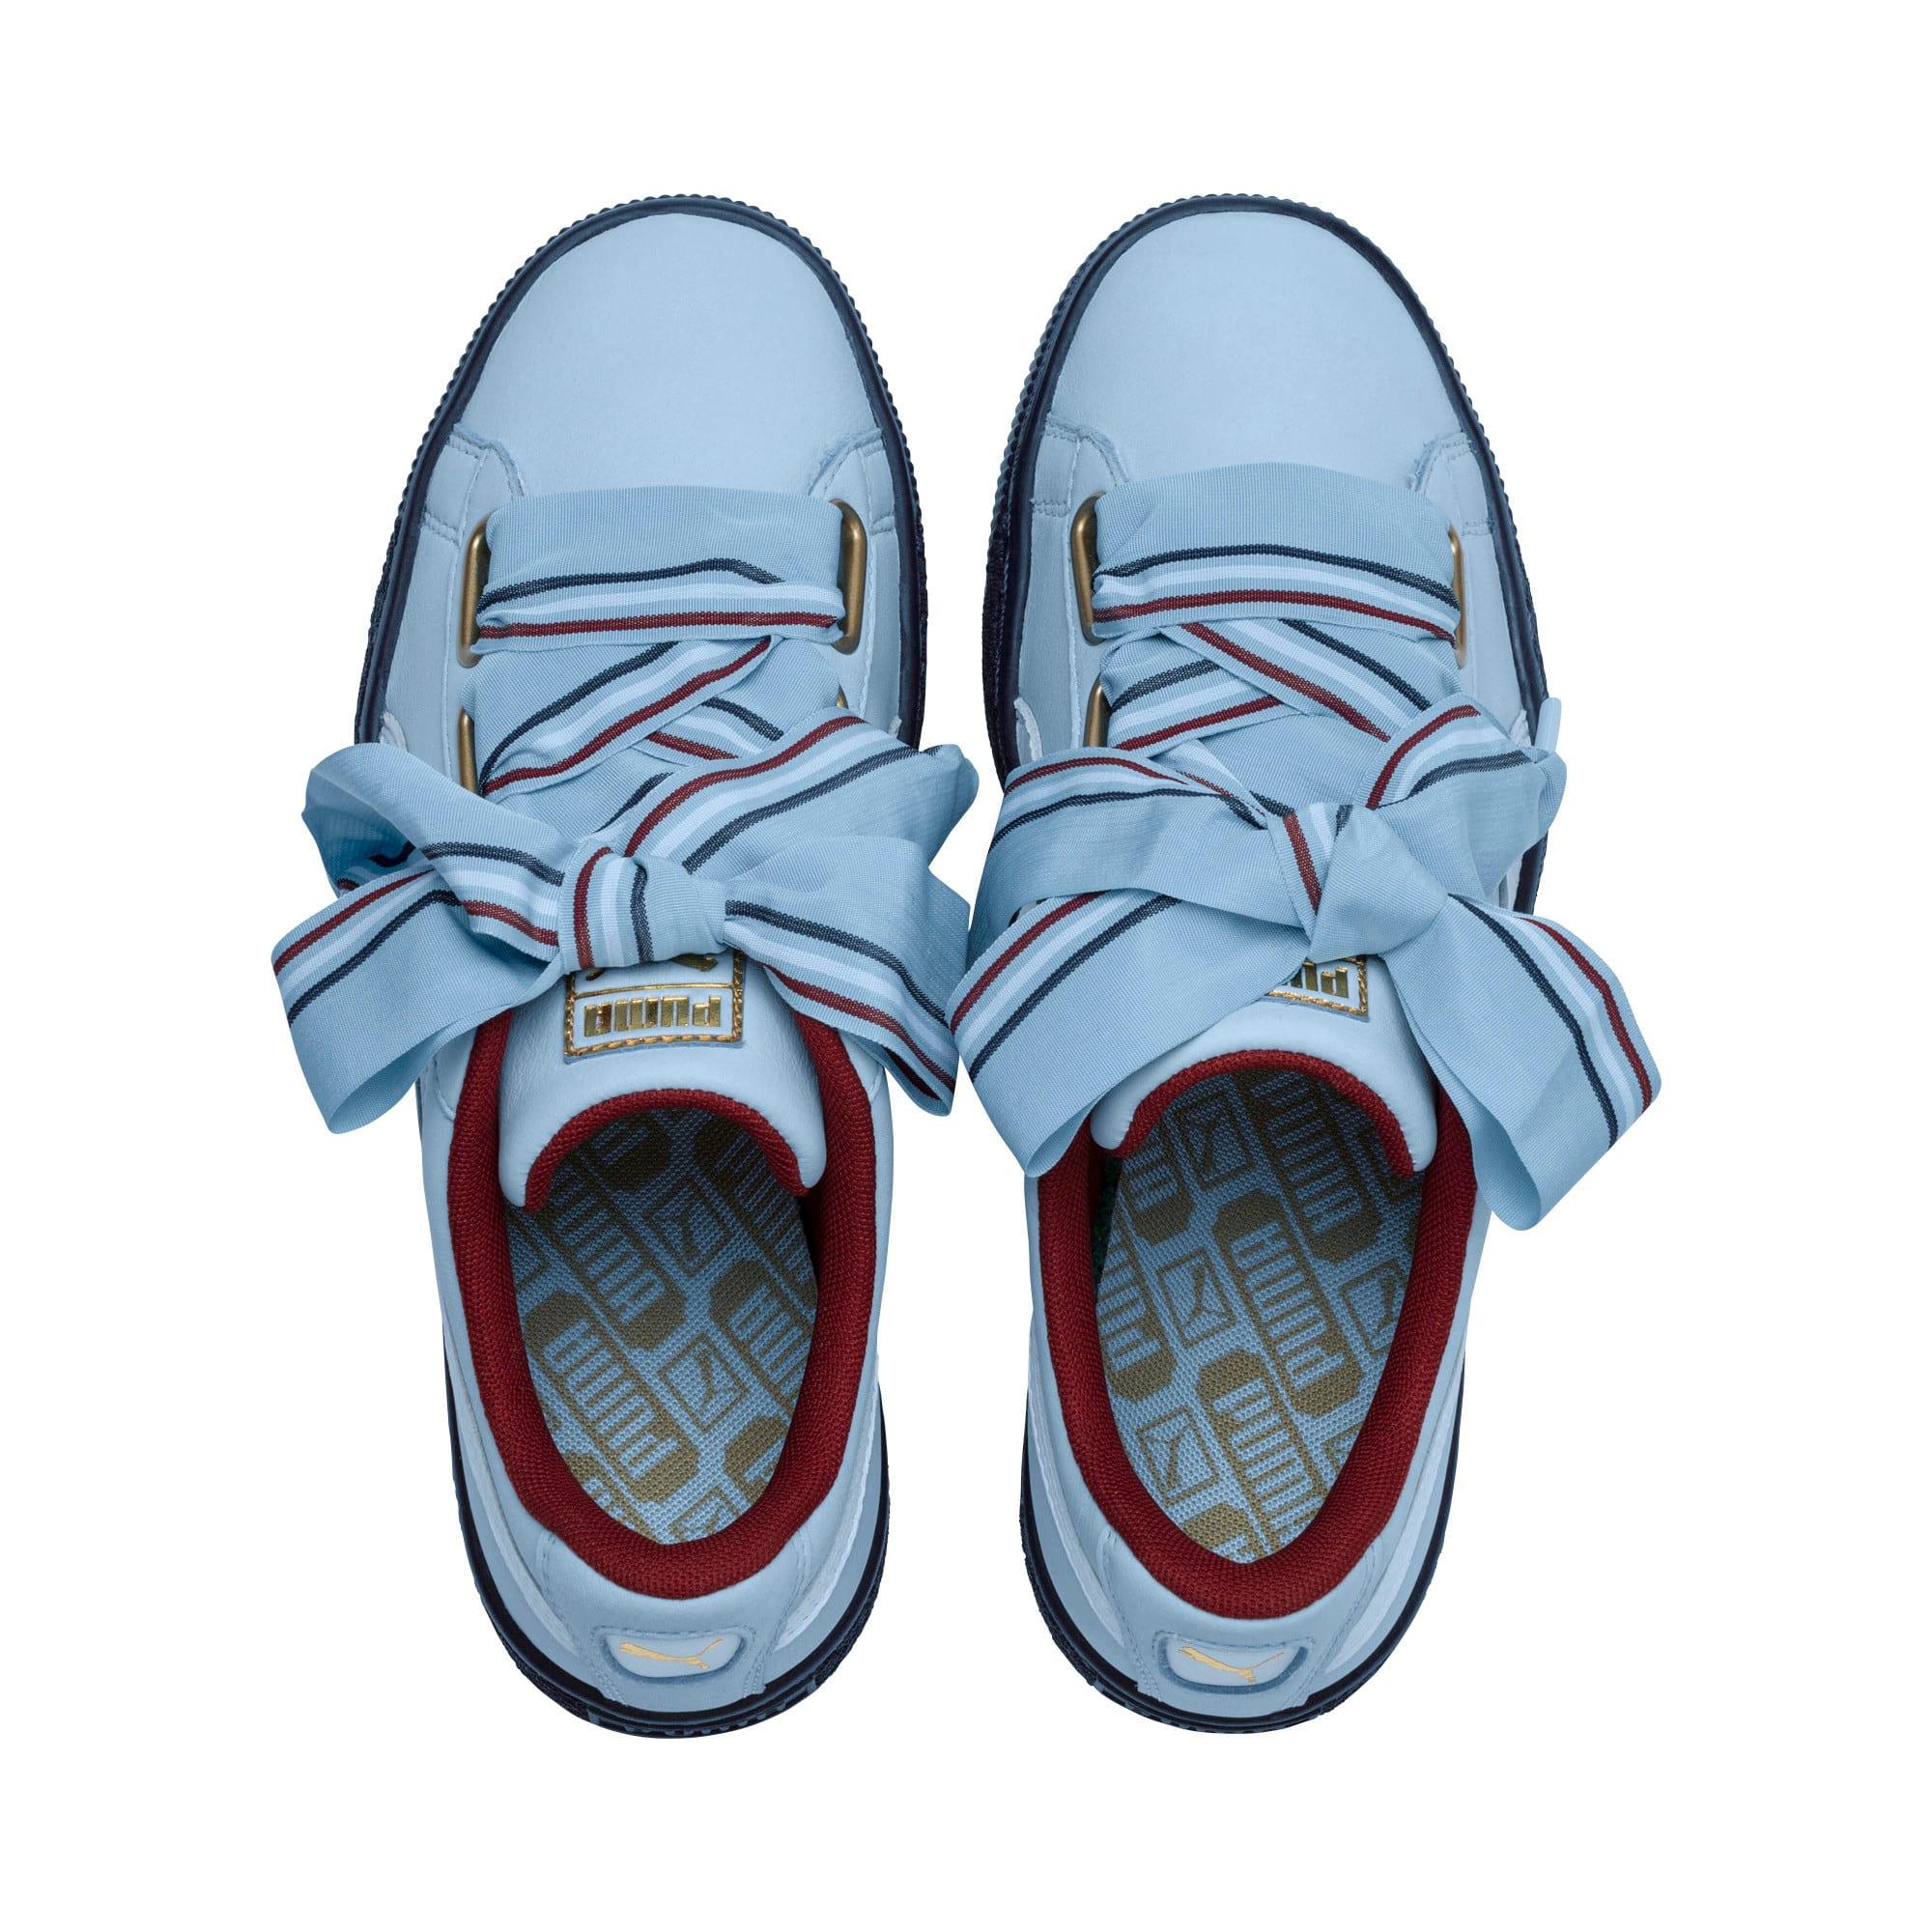 Thumbnail 6 of Basket Heart New School Women's Sneakers, CERULEAN-CERULEAN, medium